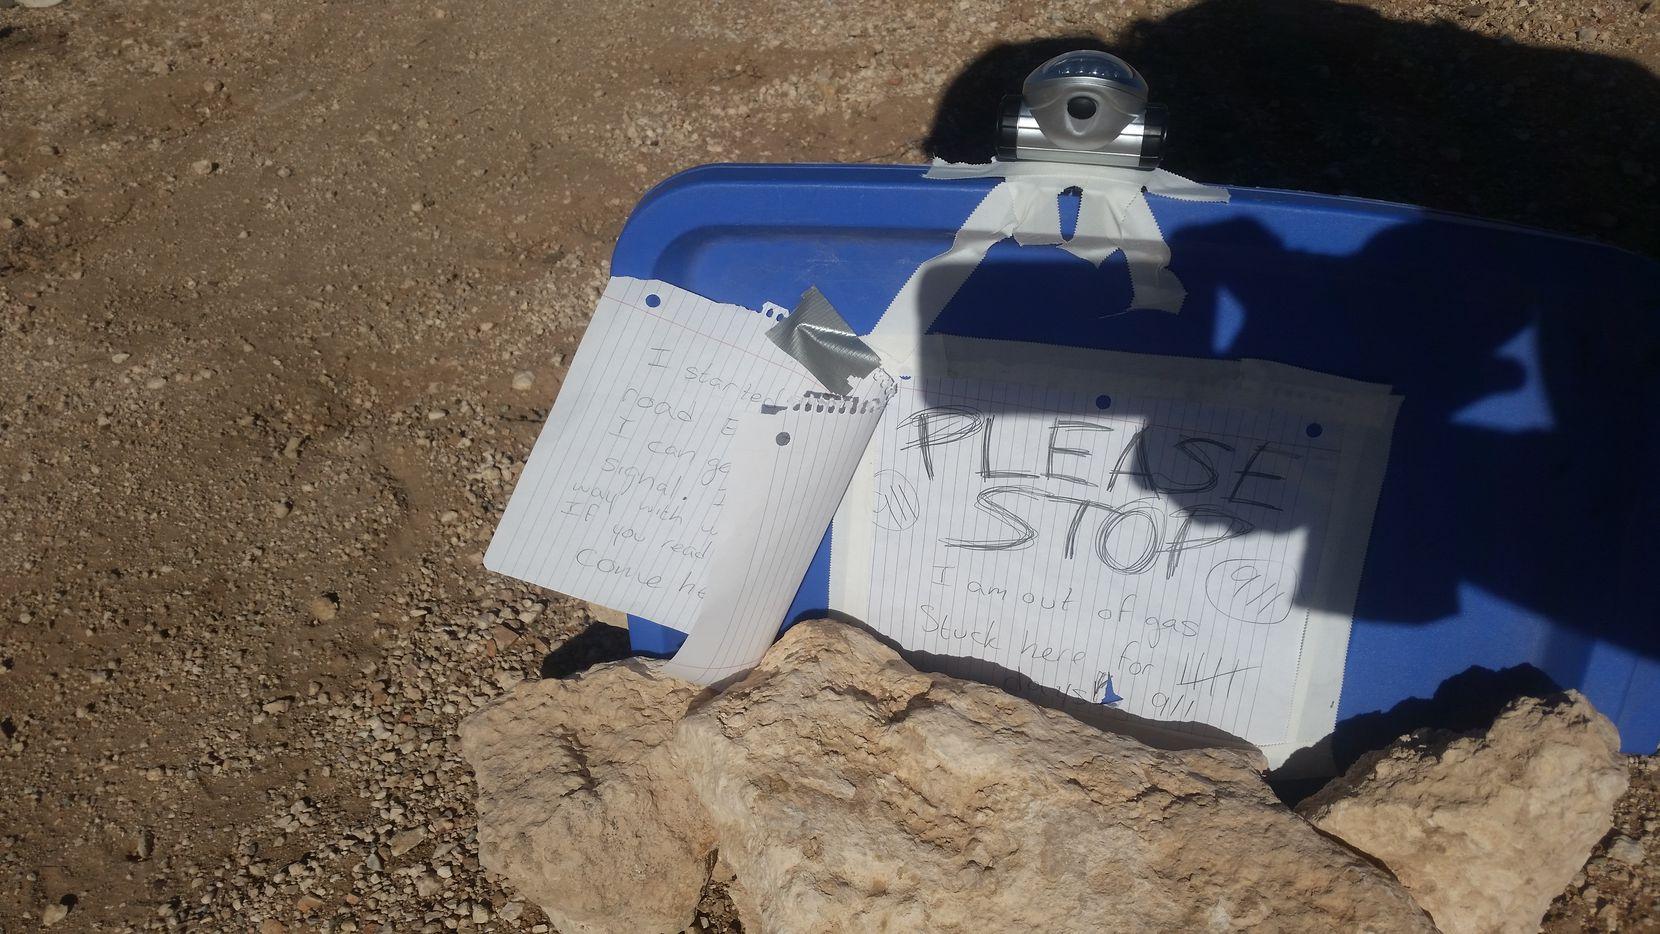 (Arizona Department of Public Safety)